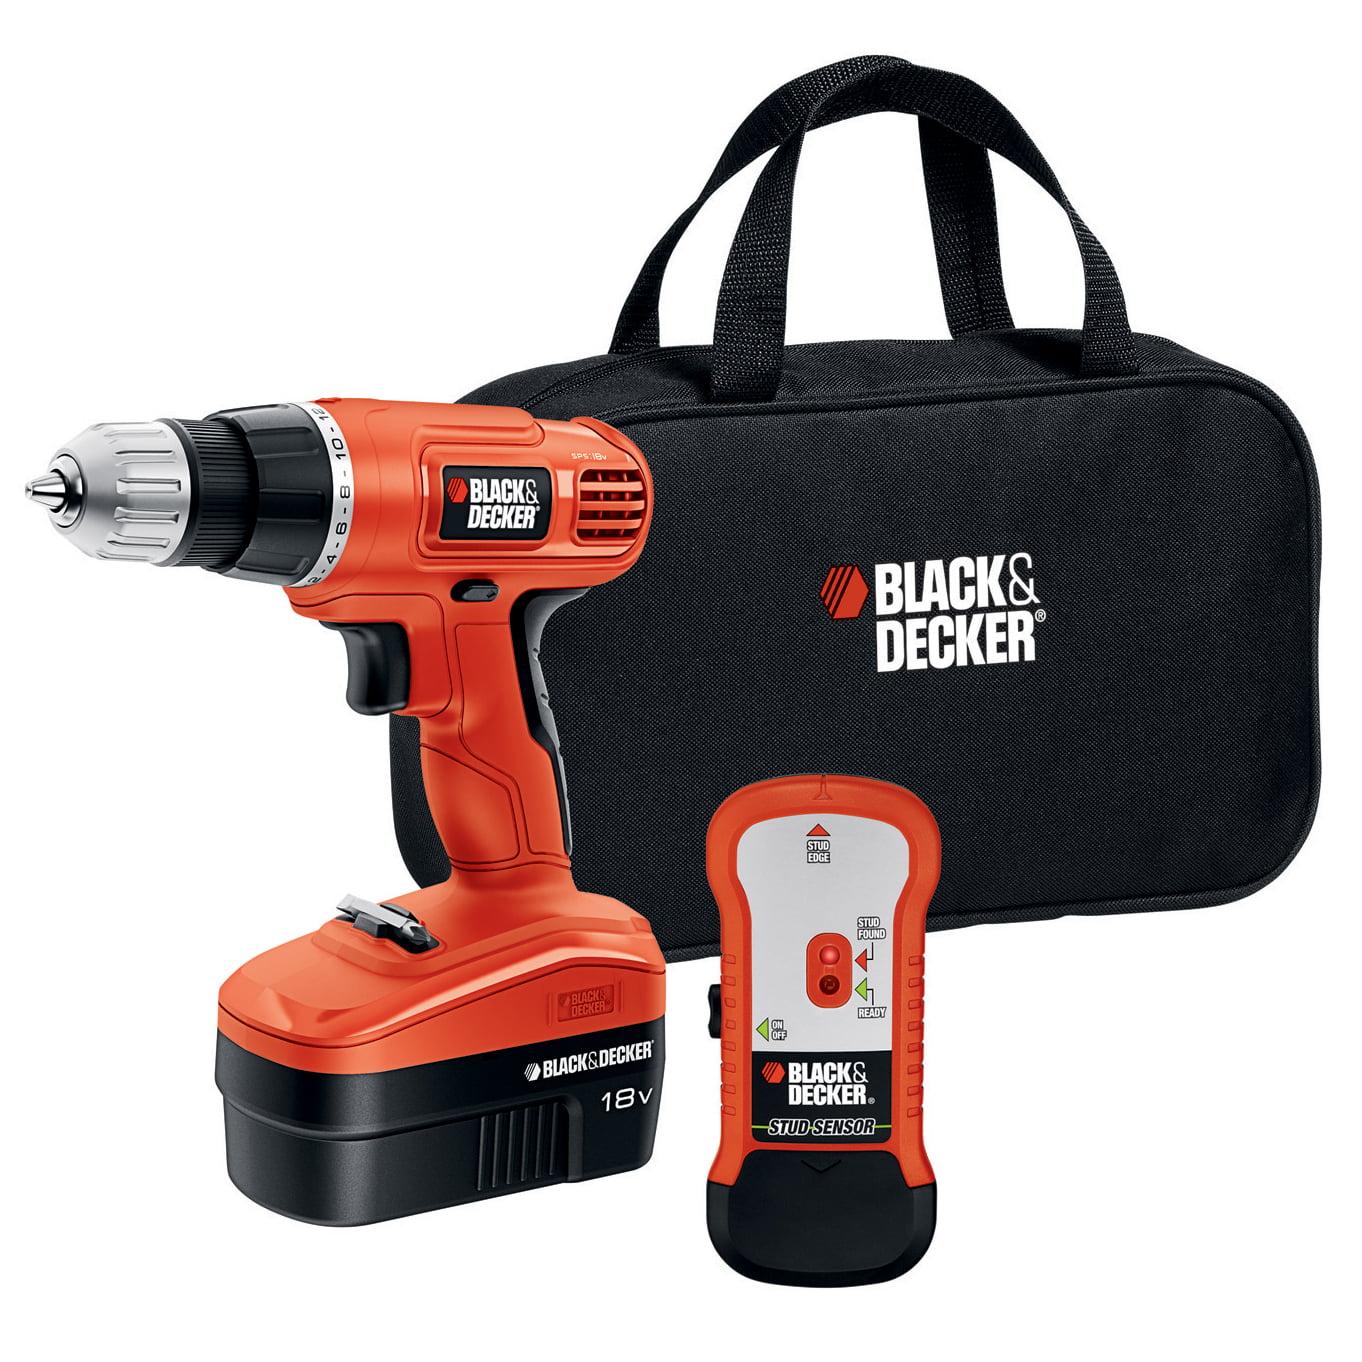 BLACK+DECKER™ GCO18SFB 18V NiCAD Cordless Drill + Stud Finder & Bag